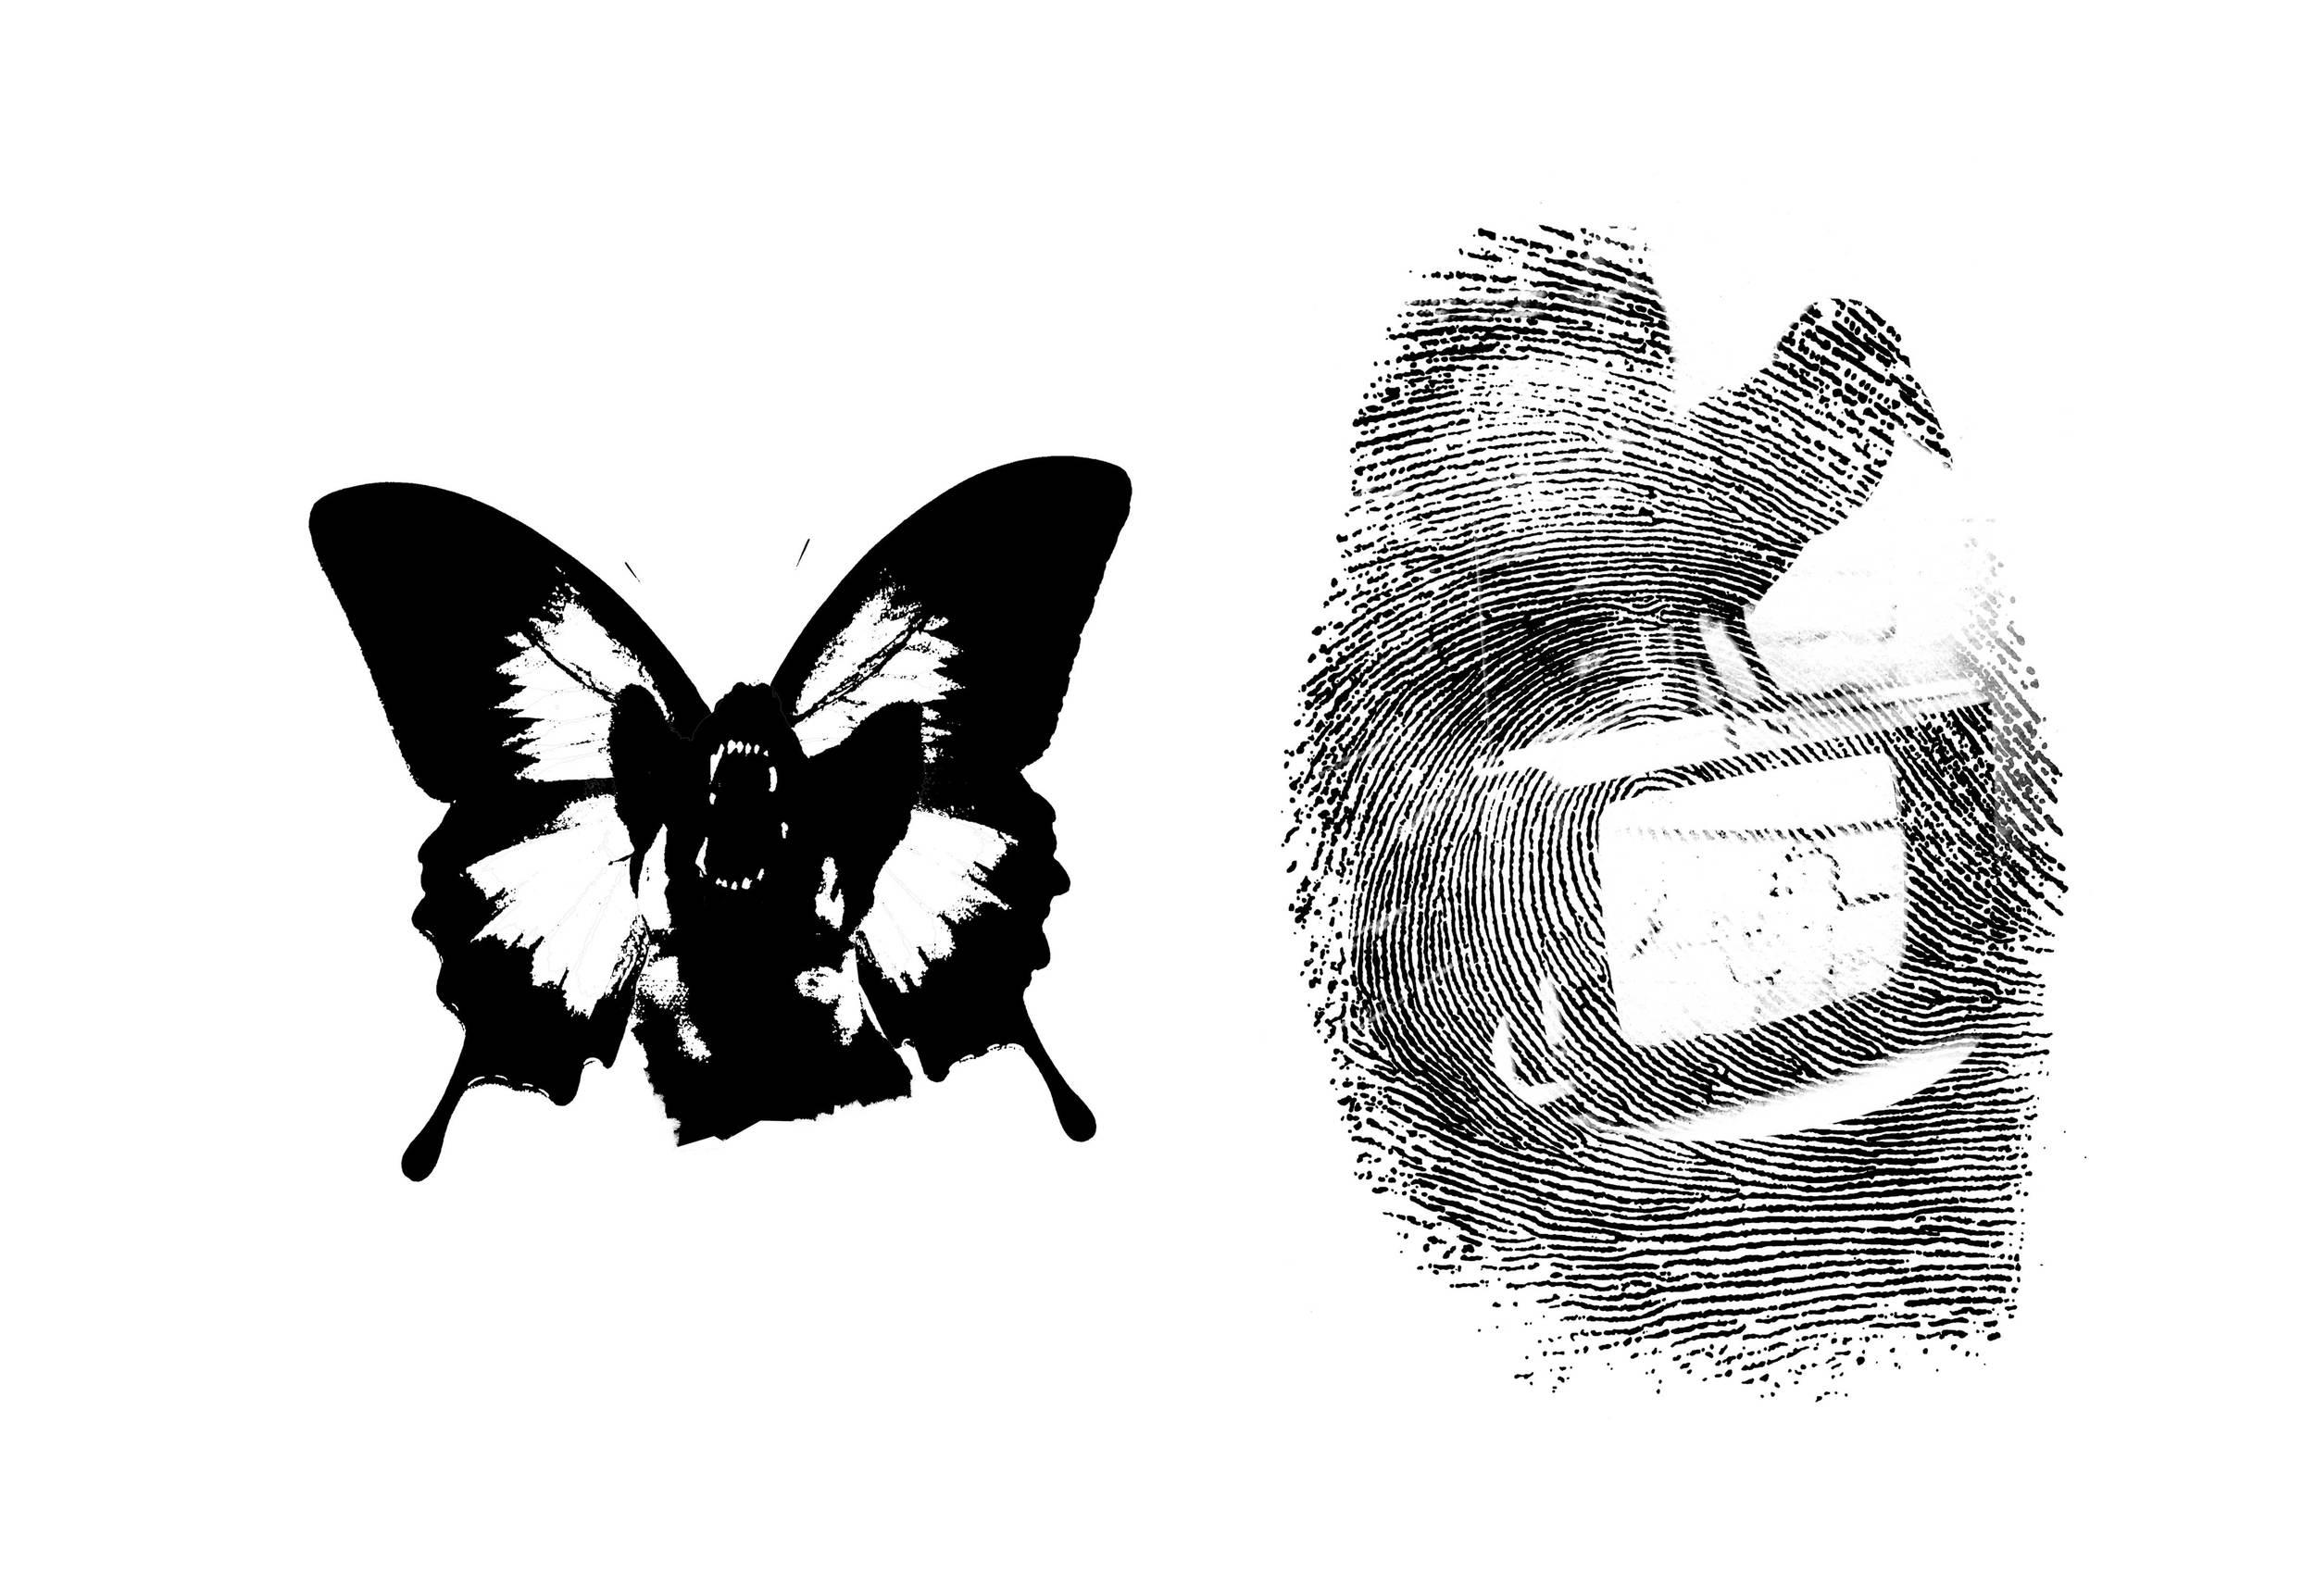 motif-2.jpg